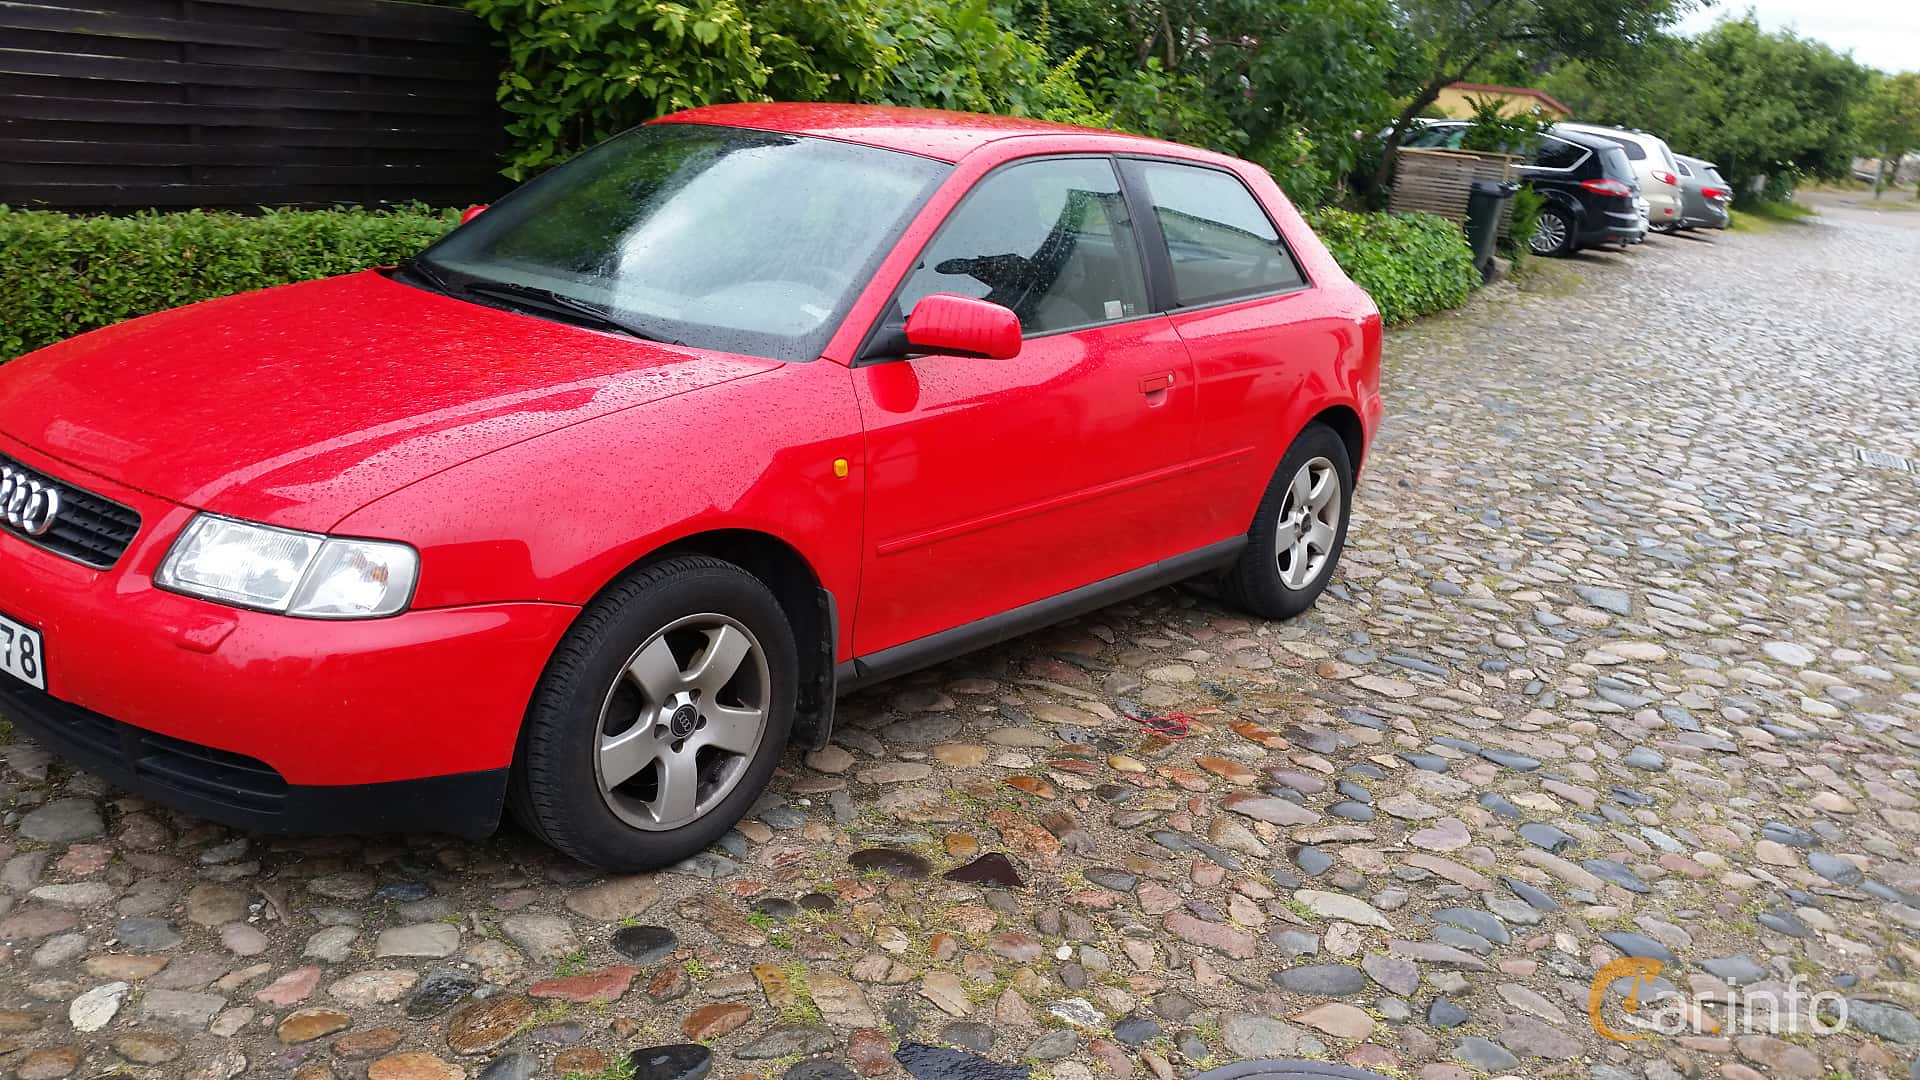 Kekurangan Audi A3 1998 Tangguh